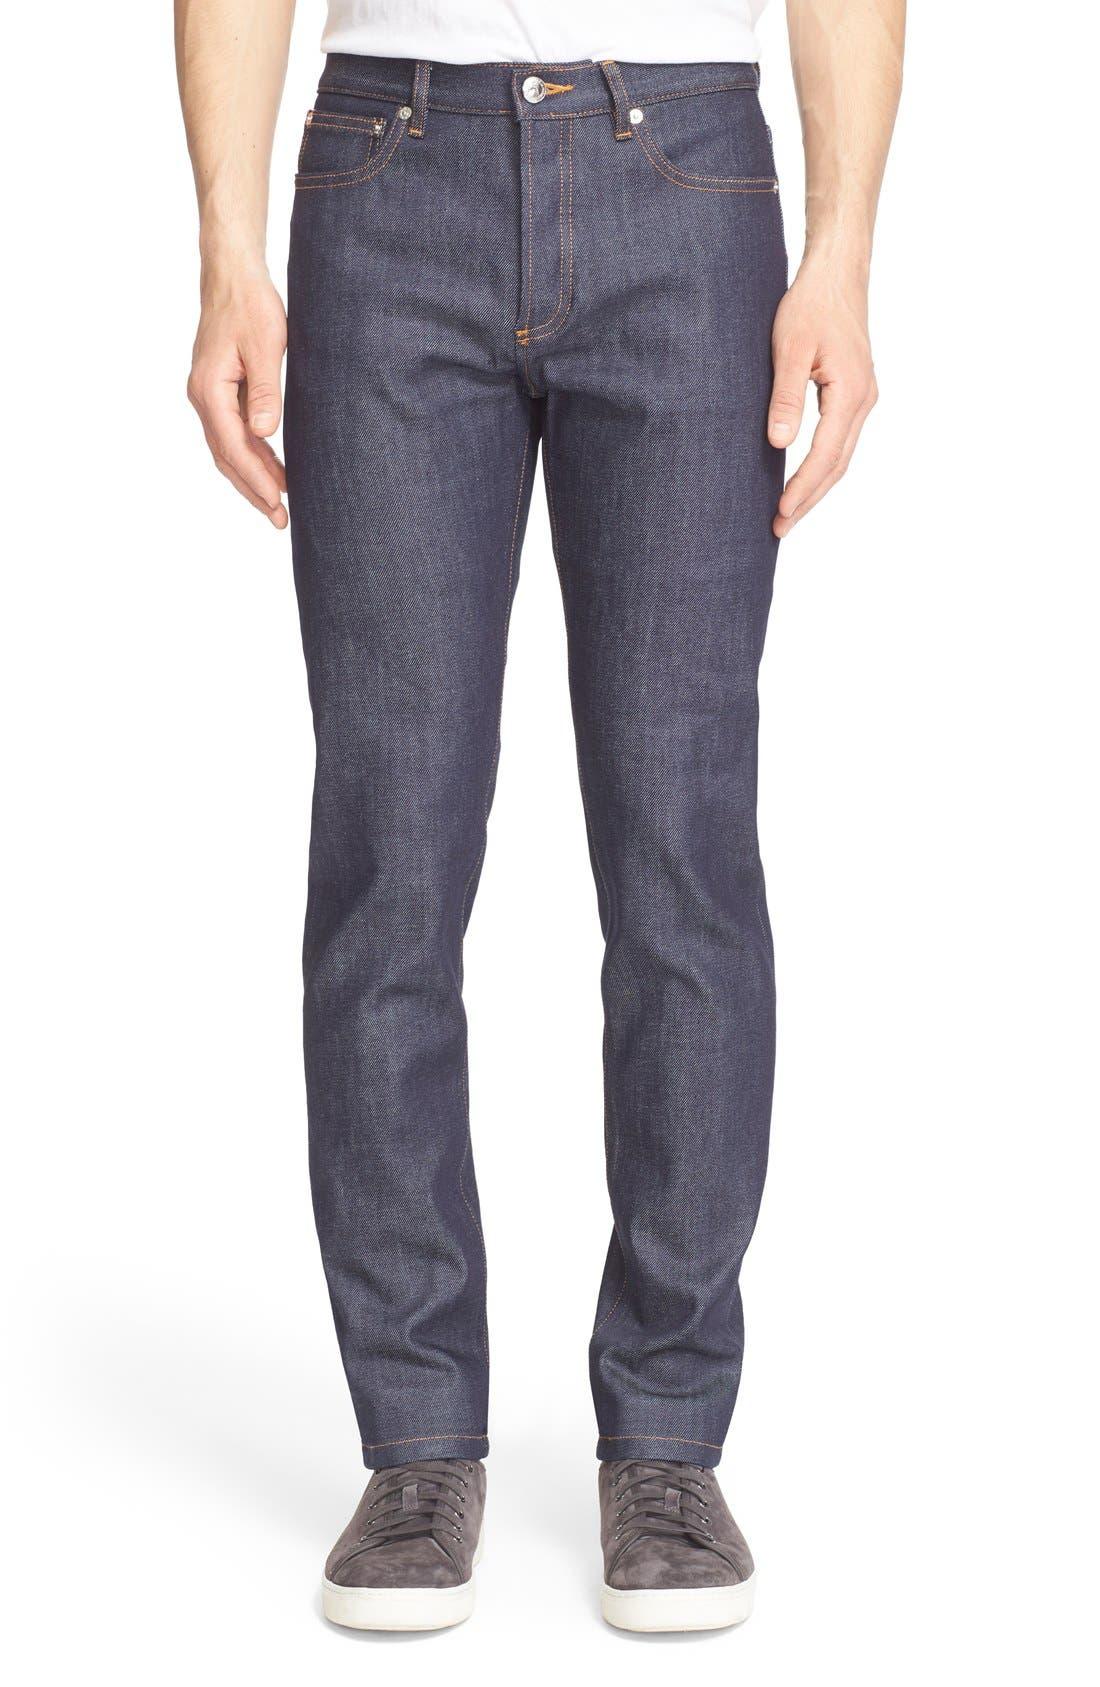 Men's A.P.C. Petite New Standard Skinny Fit Jeans